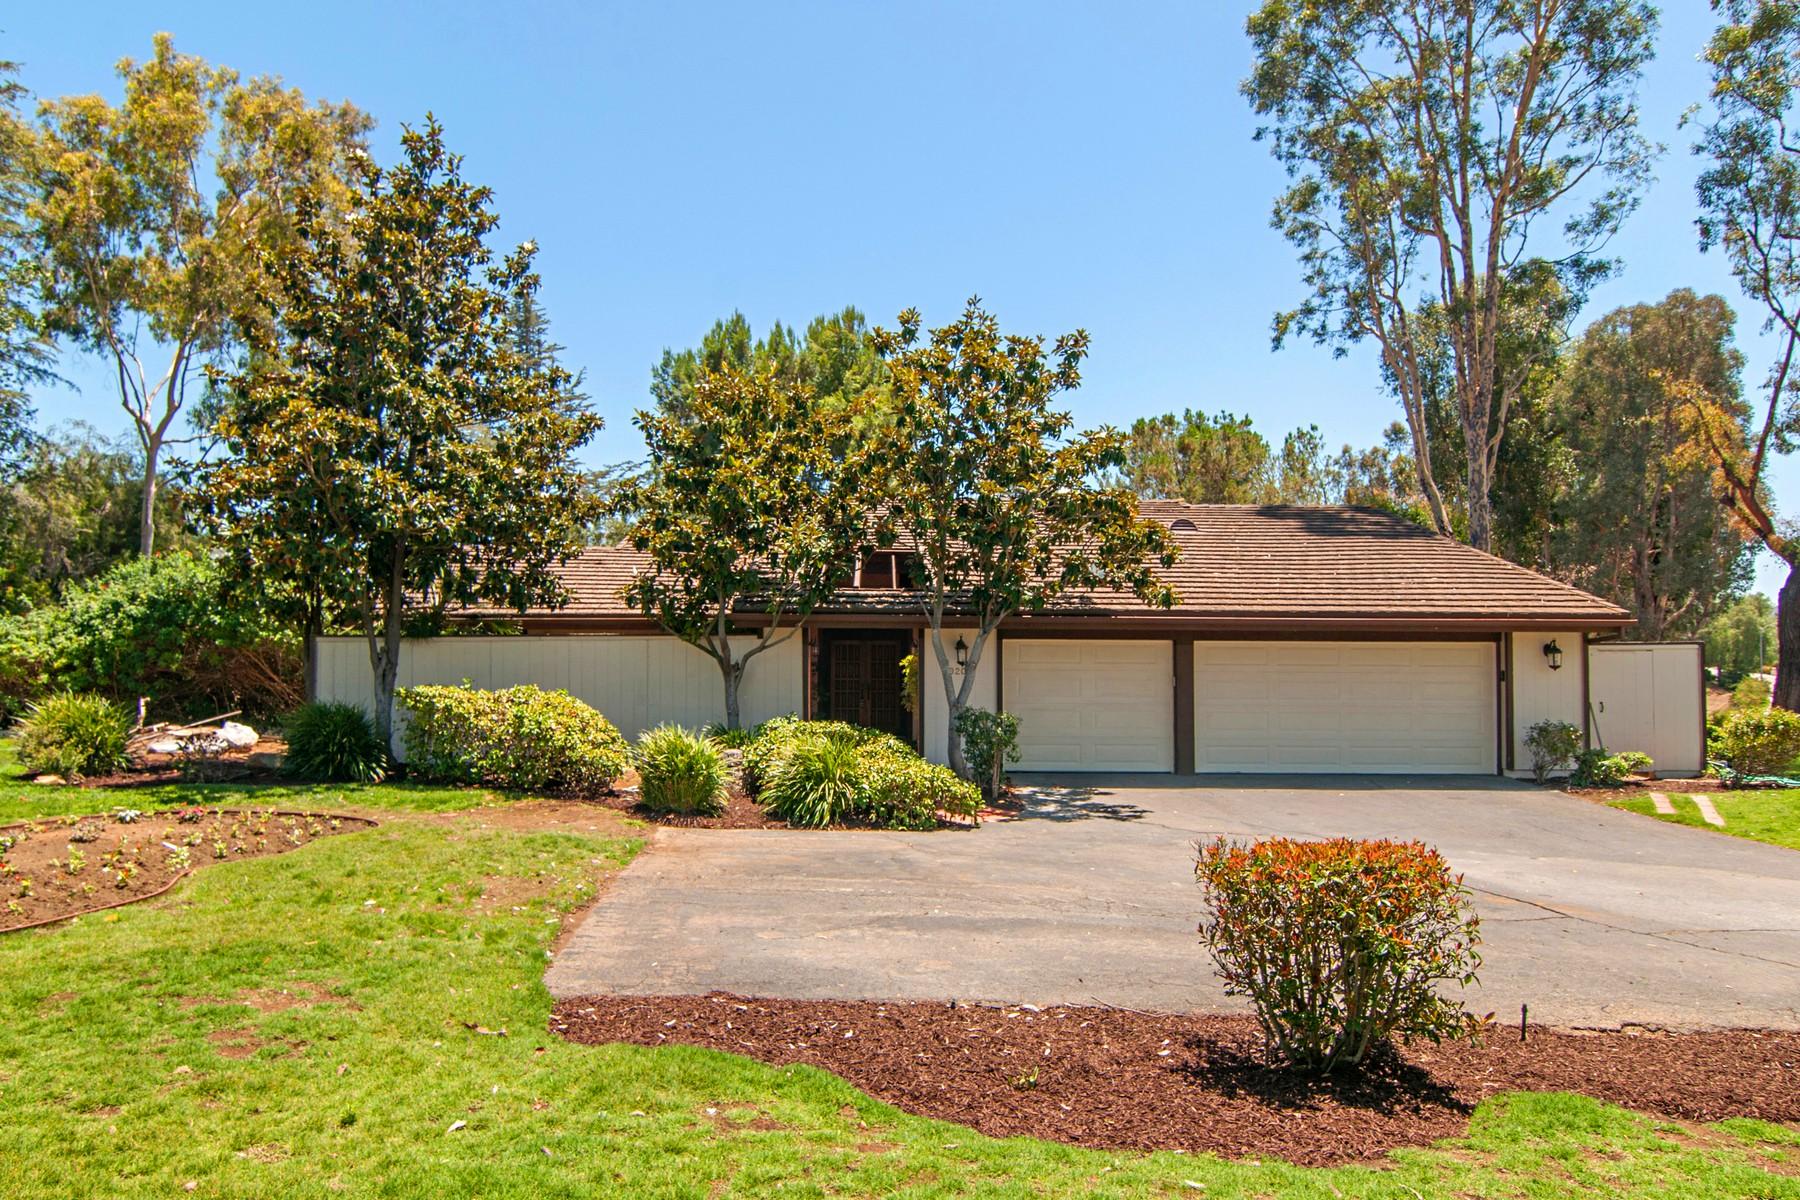 Additional photo for property listing at 3202 Avenida Hacienda  埃斯孔迪多, 加利福尼亚州 92029 美国